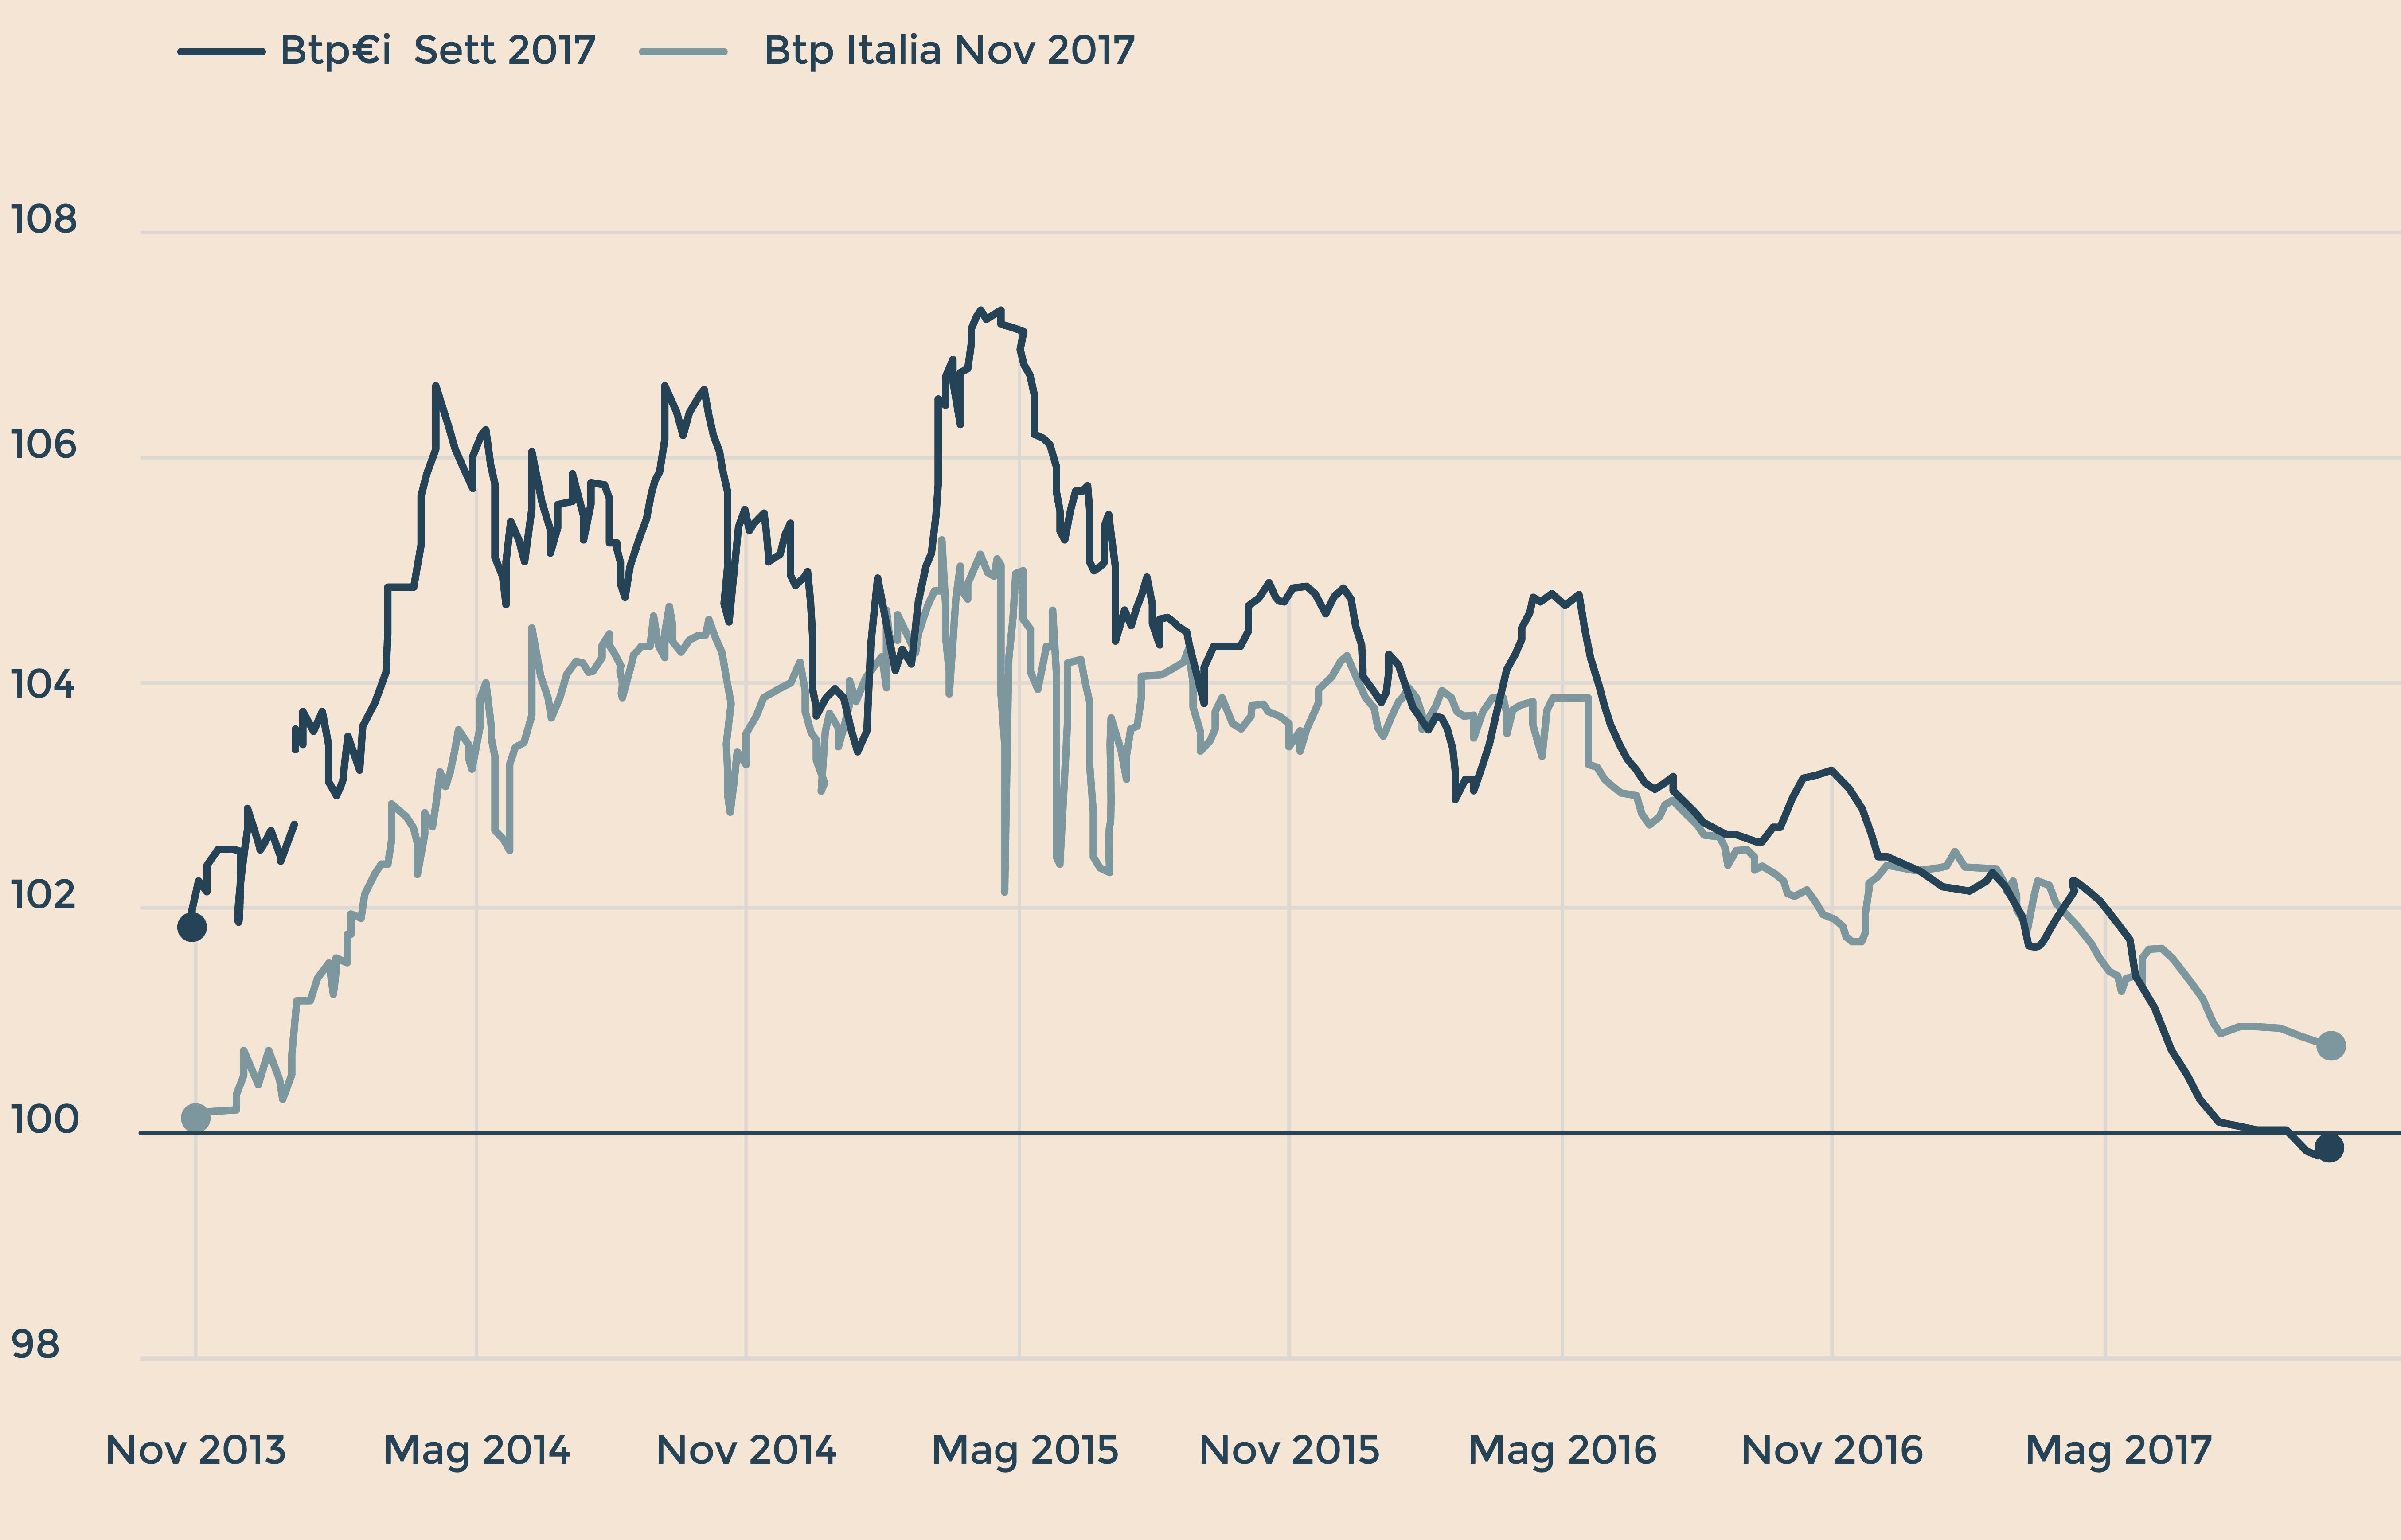 Btp Italia Convengono Segreti Bancari